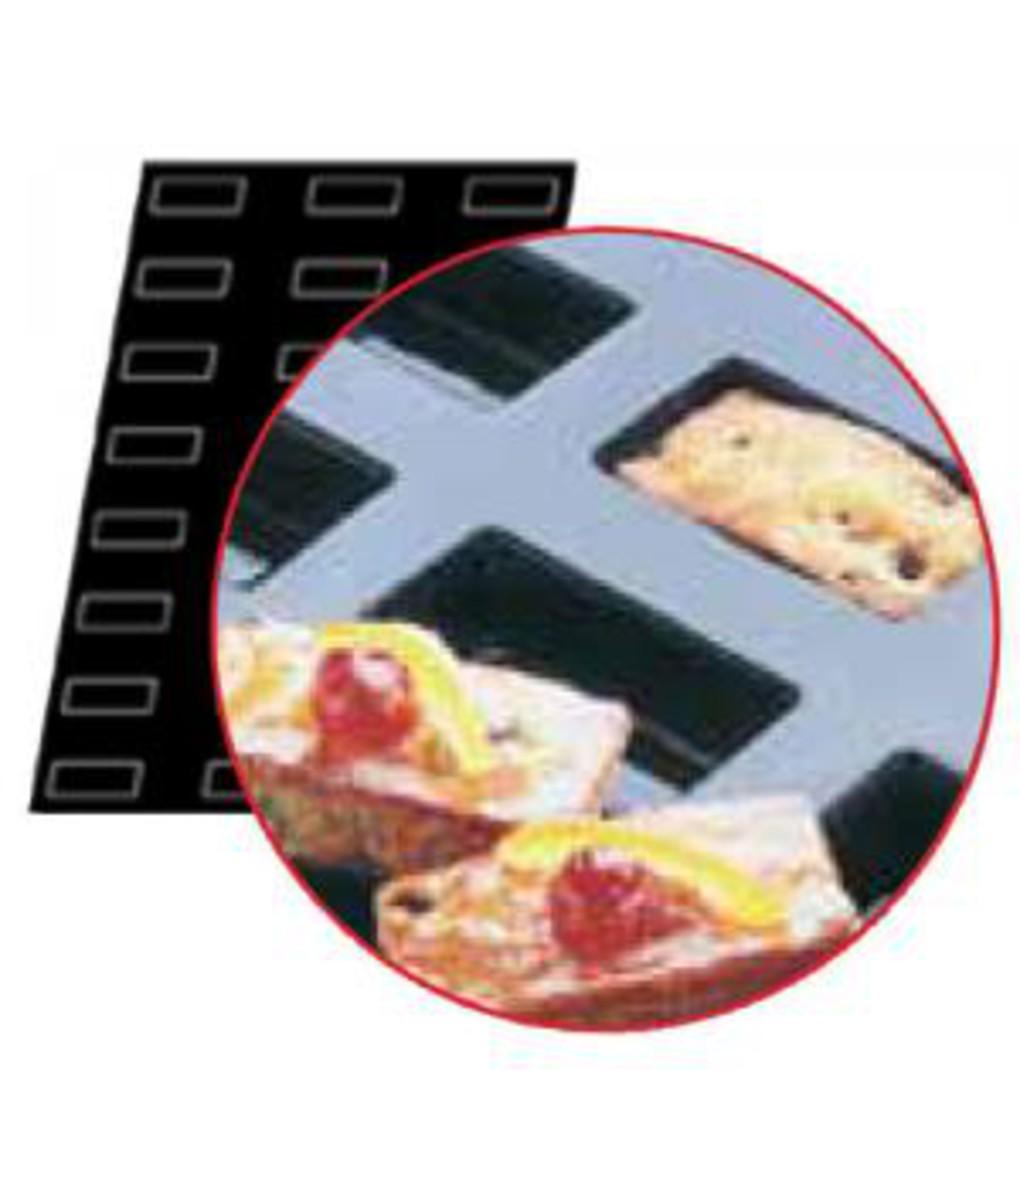 Flexipan Rectangular Cake Moulds x 25 110ml - 89x46x25mm by Matfer Bourge